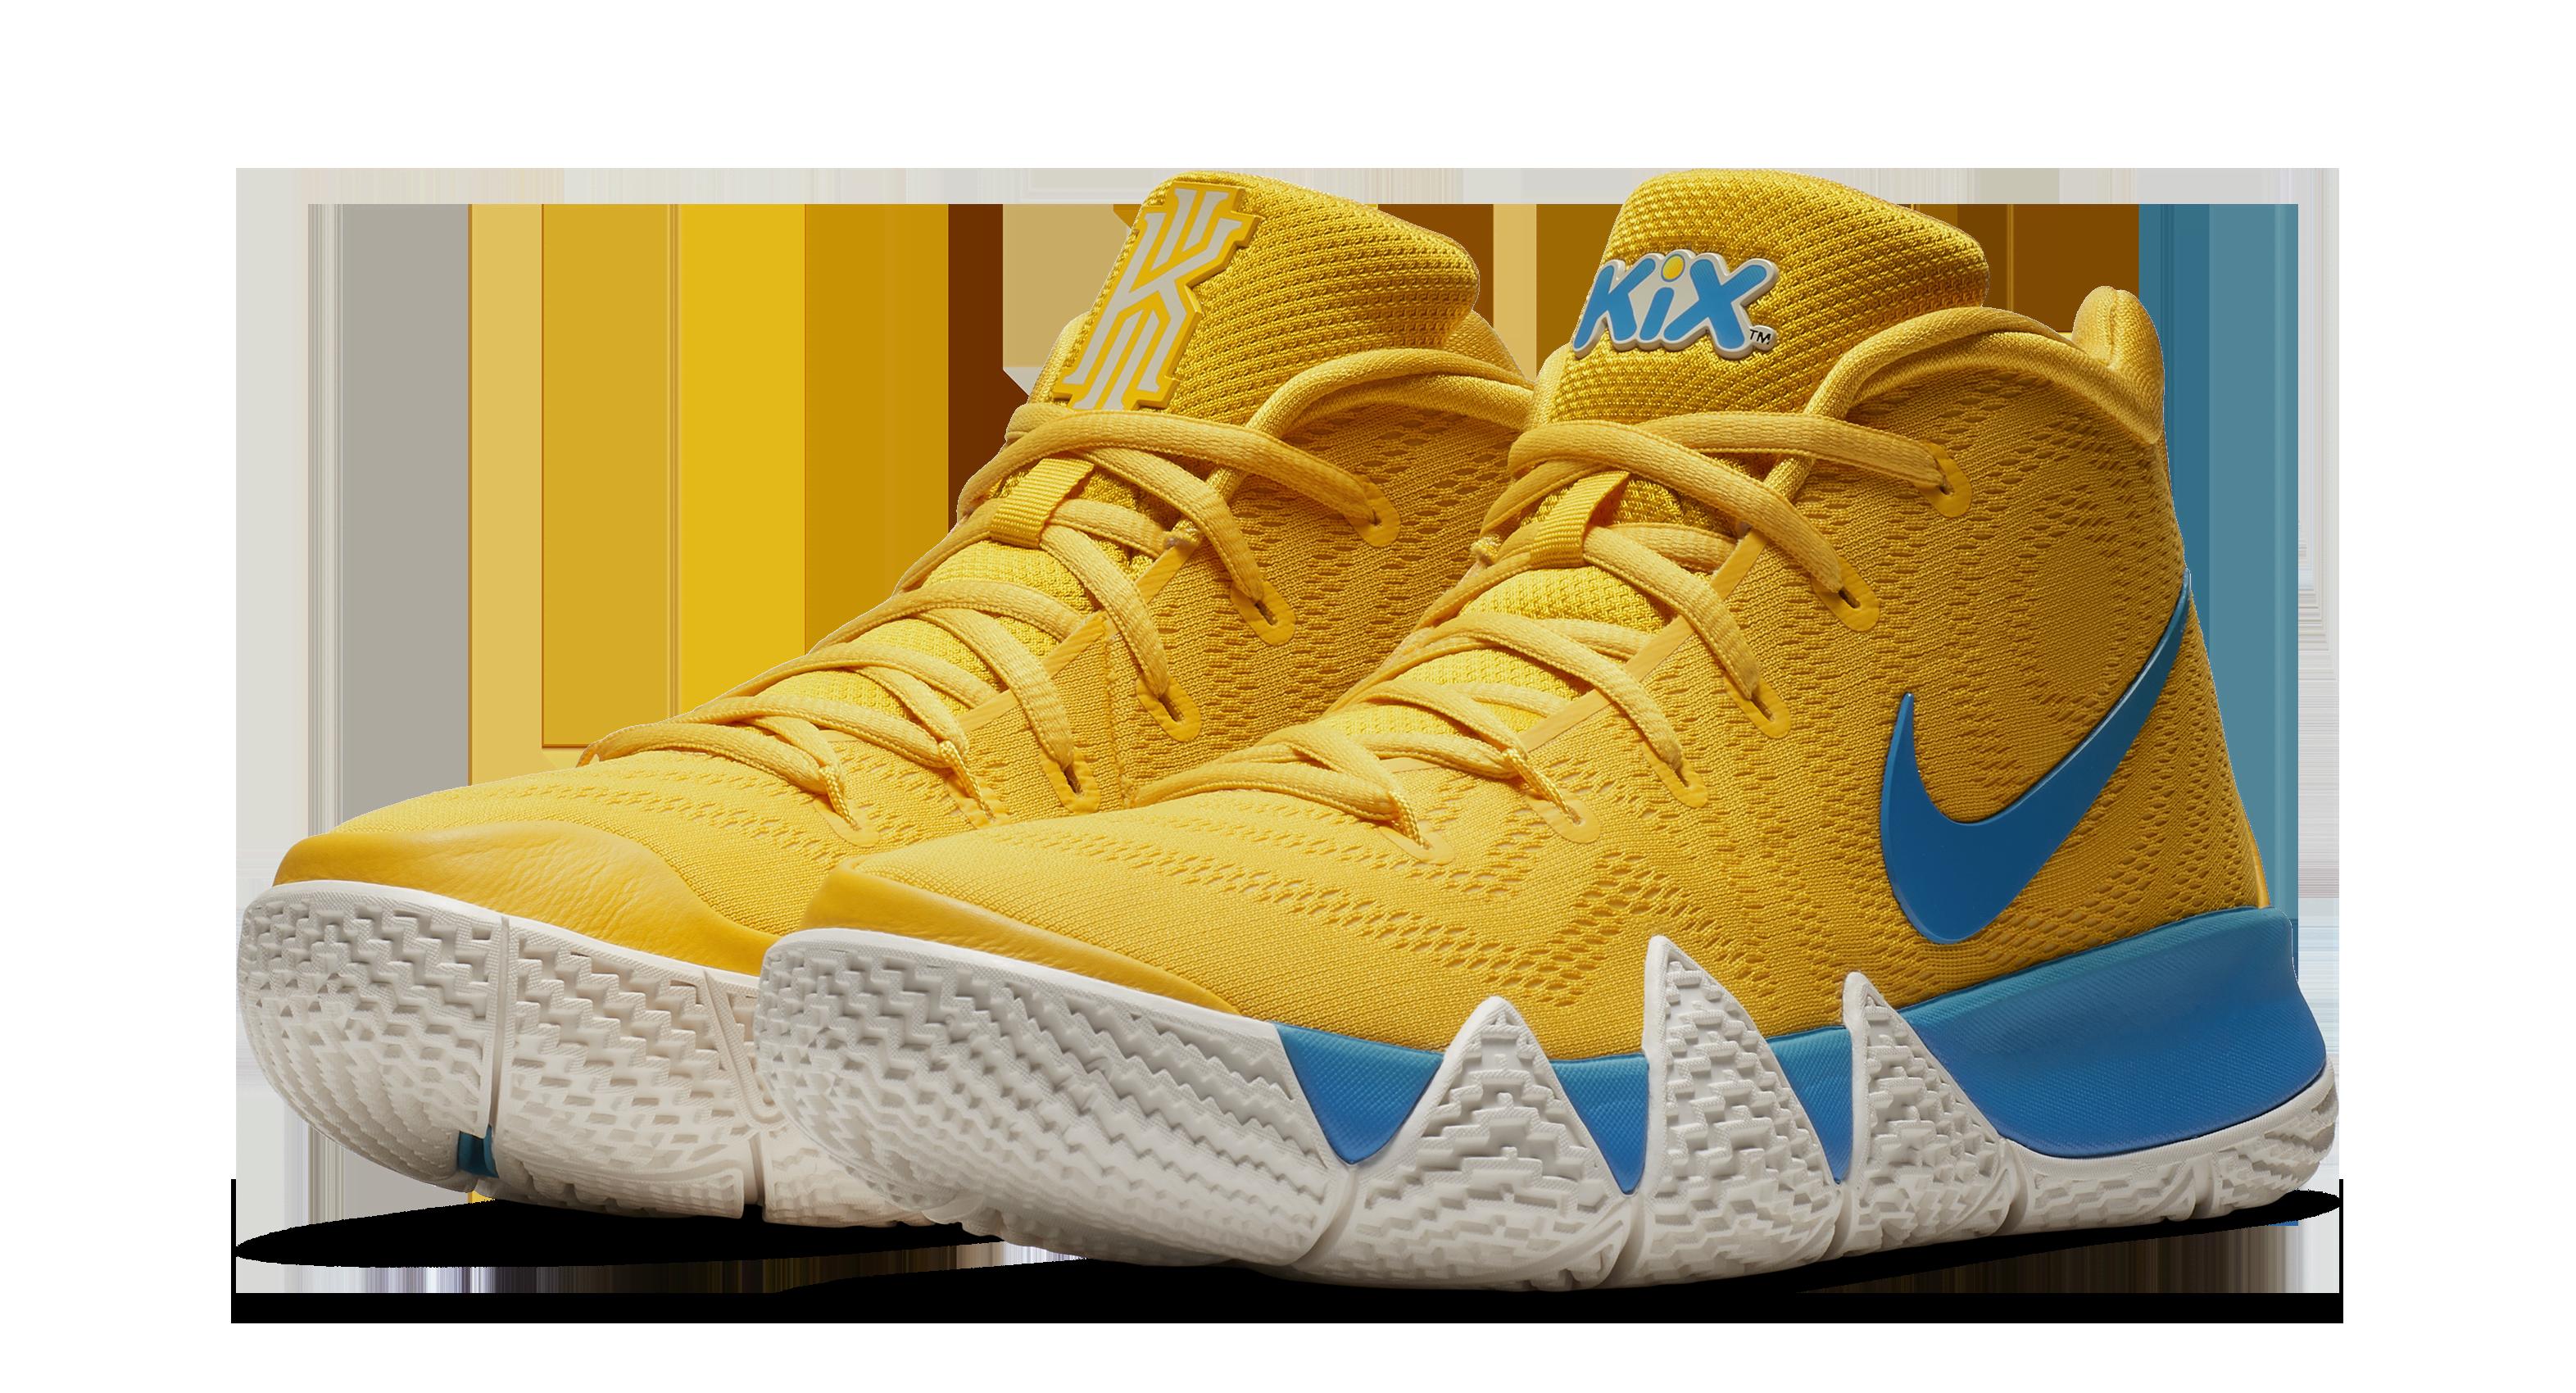 Nike Kyrie 4 'Kix'